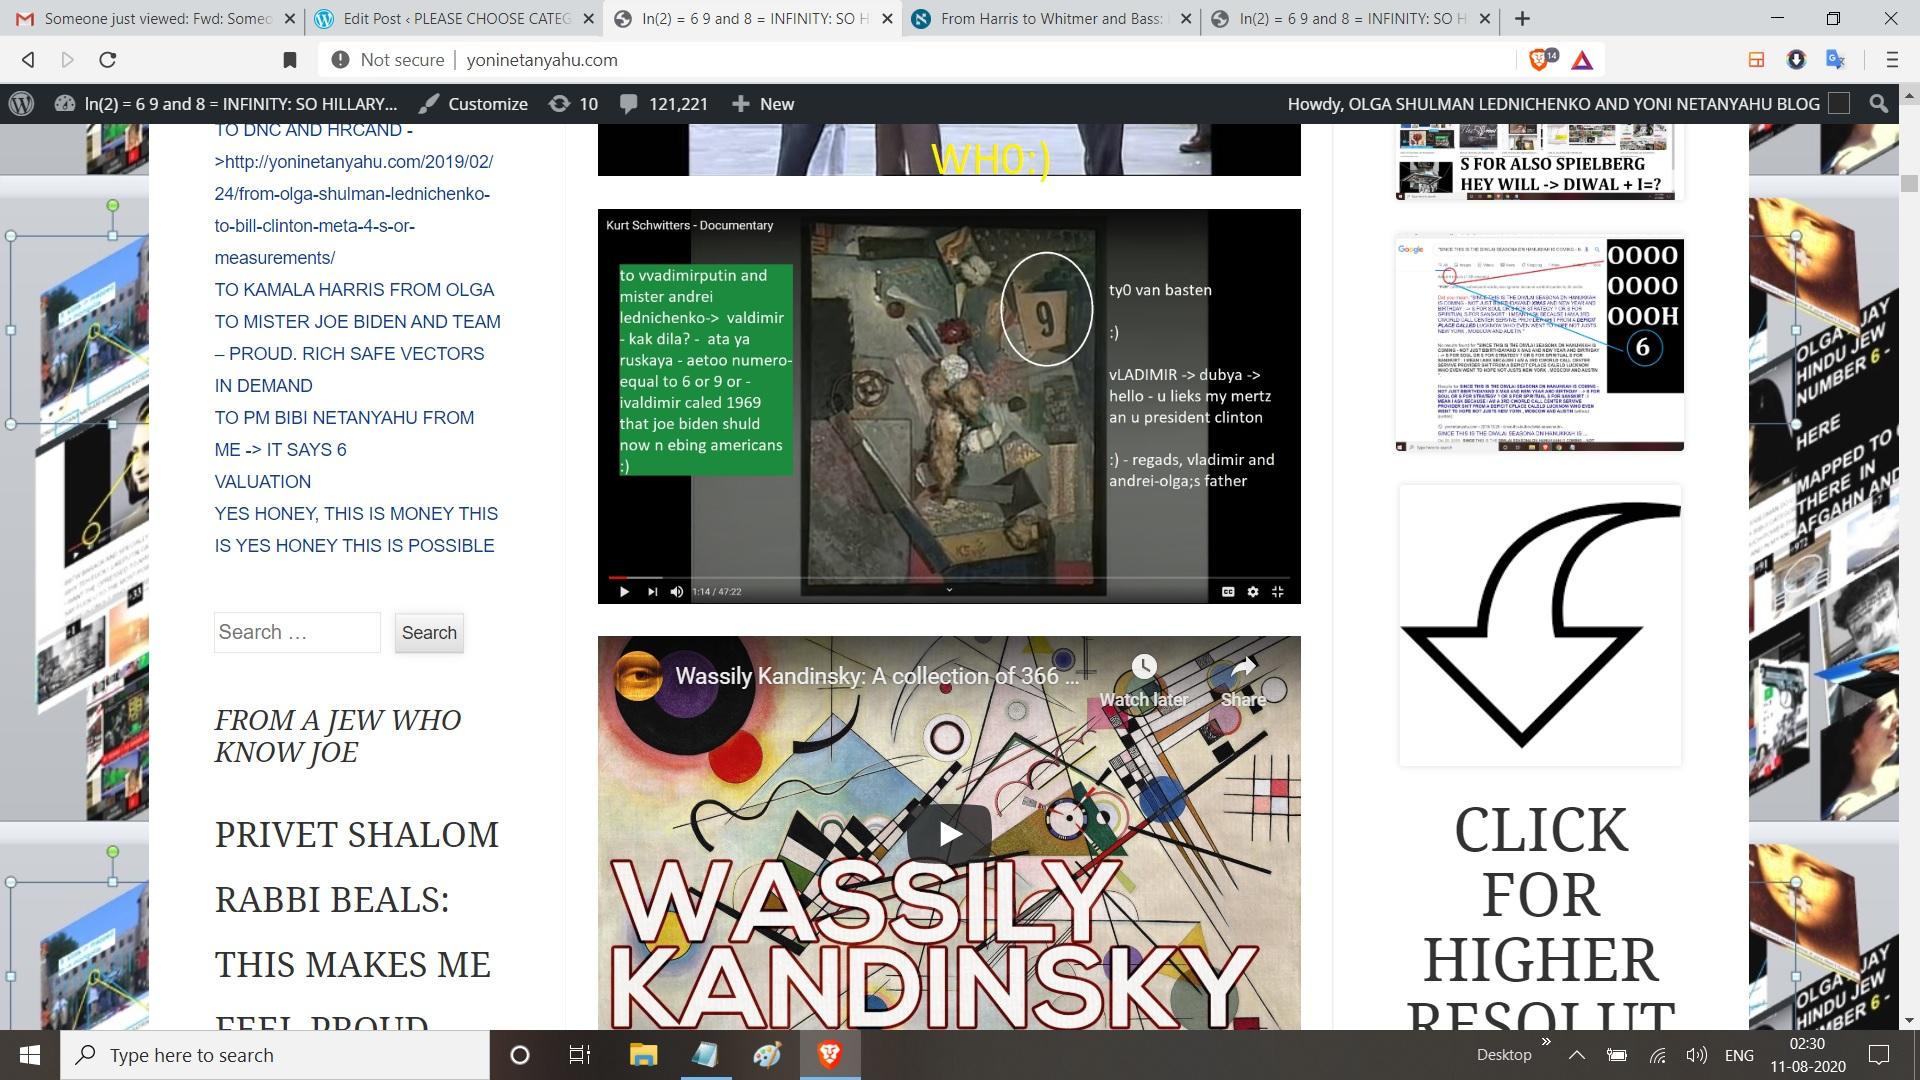 KANDINSKY AND KURT SWITSERS - WHO REGARSA AJAY MISHRA